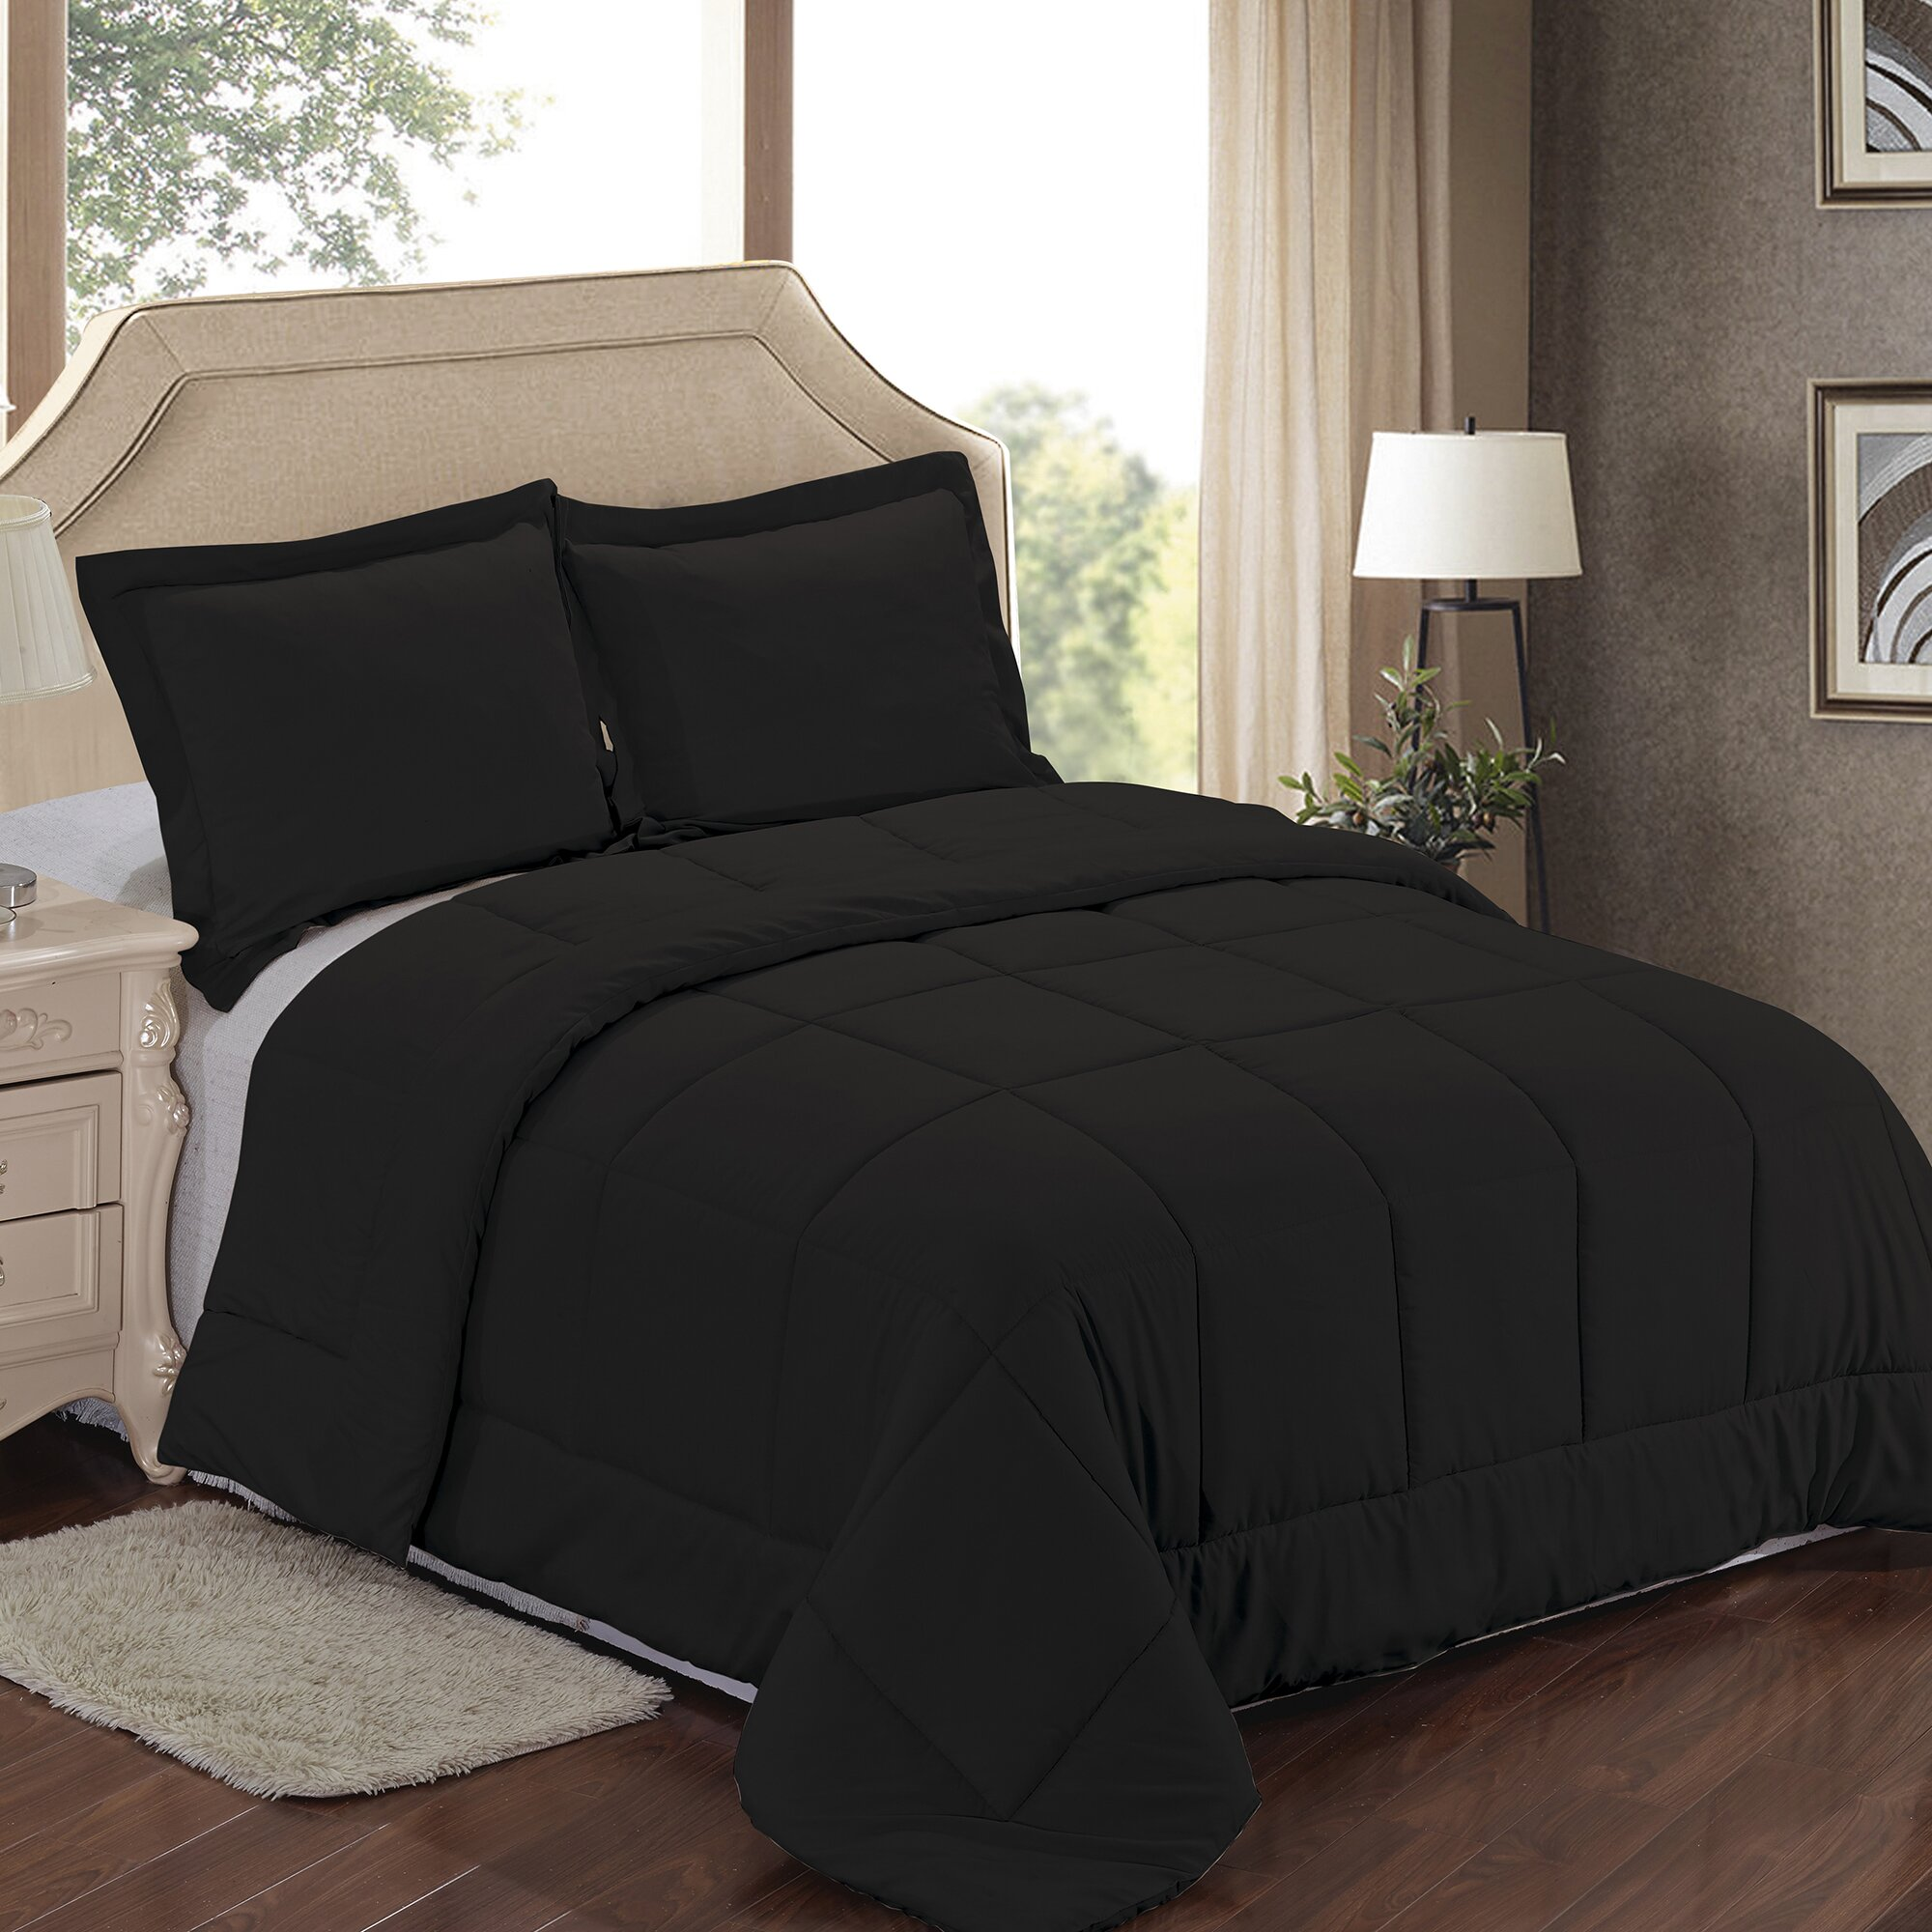 Sweet Home Collection Comforter Set & Reviews | Wayfair